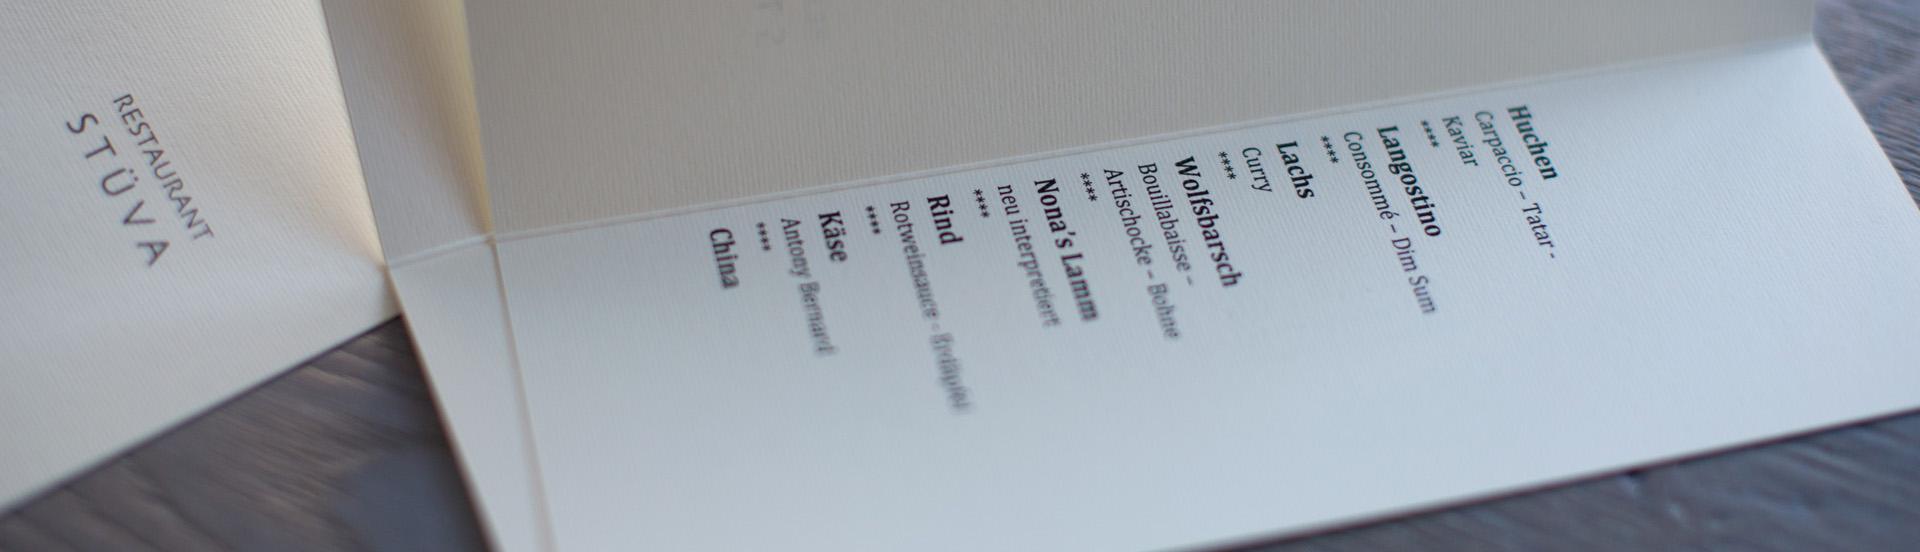 blog-yscla-stueva-neue-menues